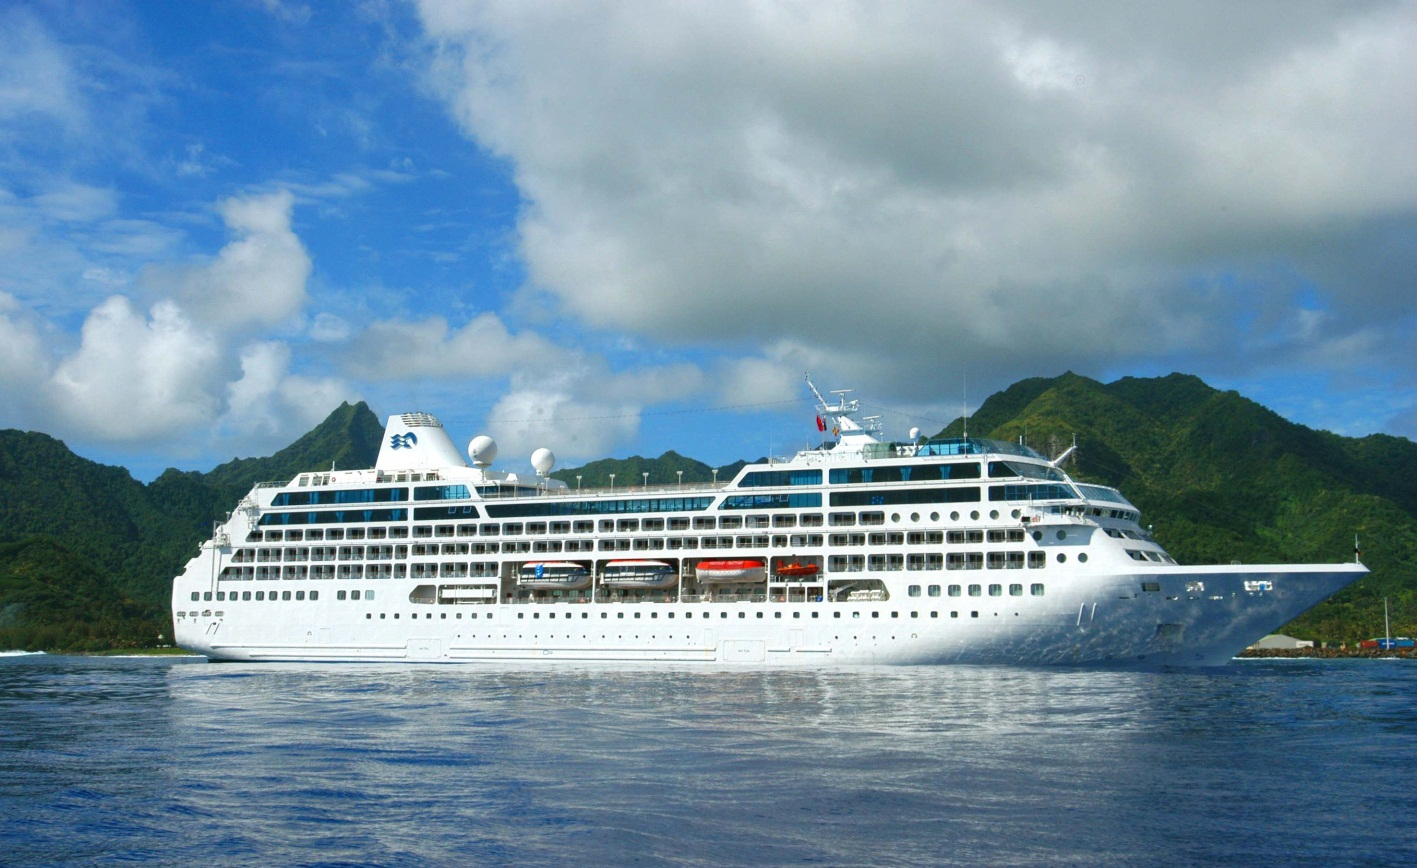 Princess Cruises Luxury Travel Blog Luxury Travel Reviews - Cruise to south america